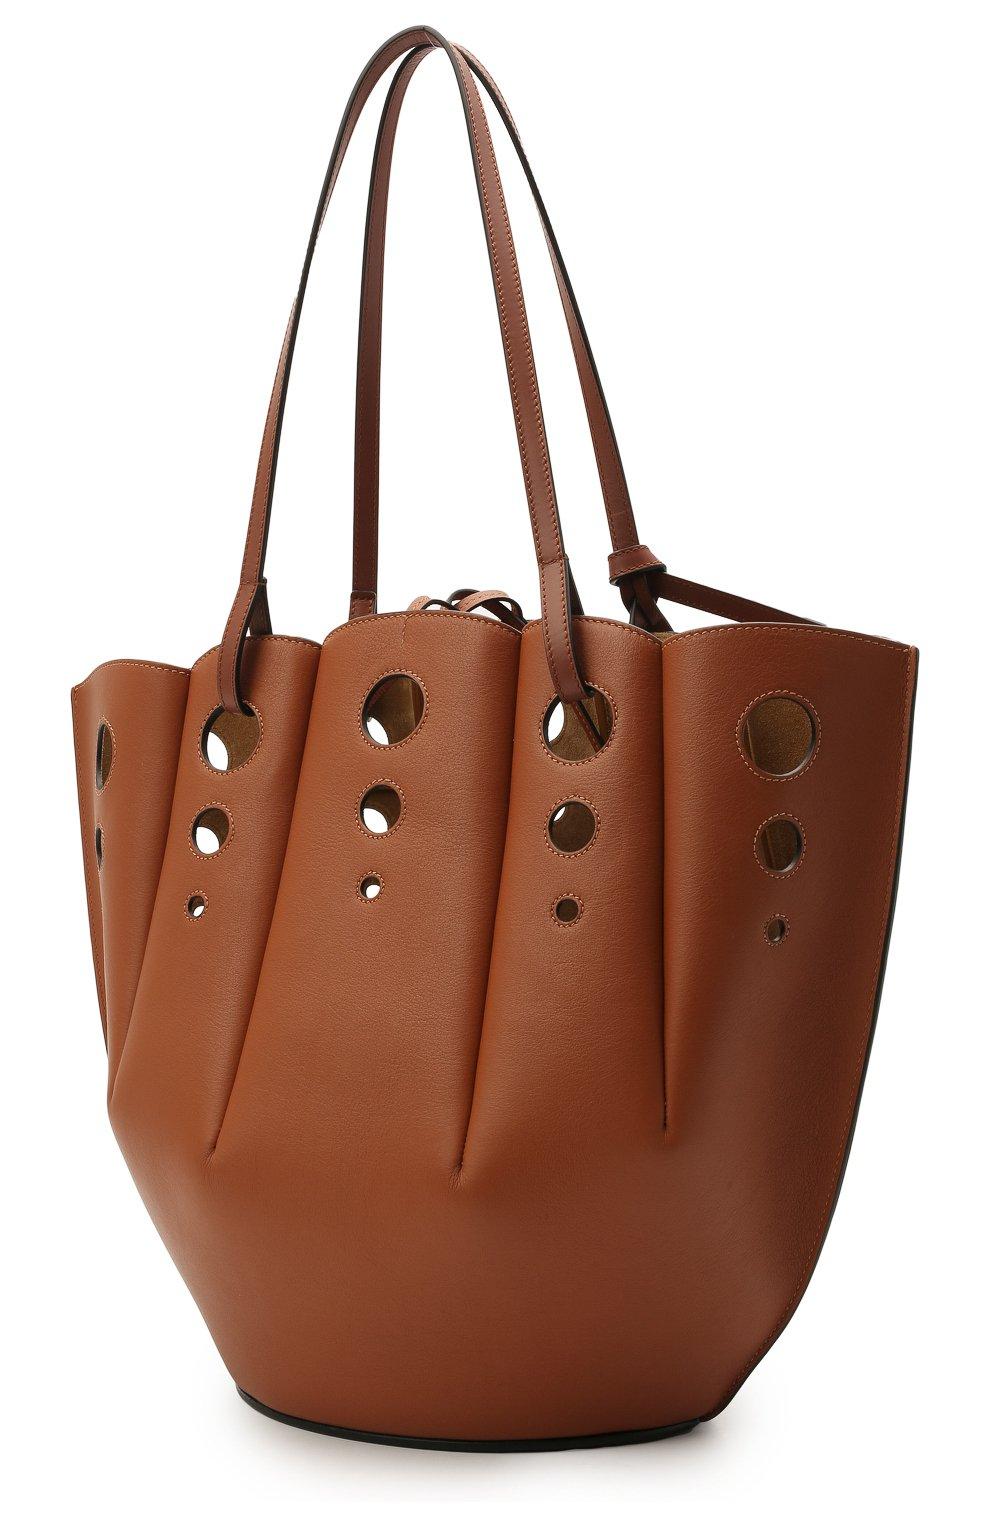 Женский сумка-тоут shell LOEWE коричневого цвета, арт. A657R52X13 | Фото 3 (Сумки-технические: Сумки-шопперы; Ошибки технического описания: Нет ширины; Размер: medium; Материал: Натуральная кожа)